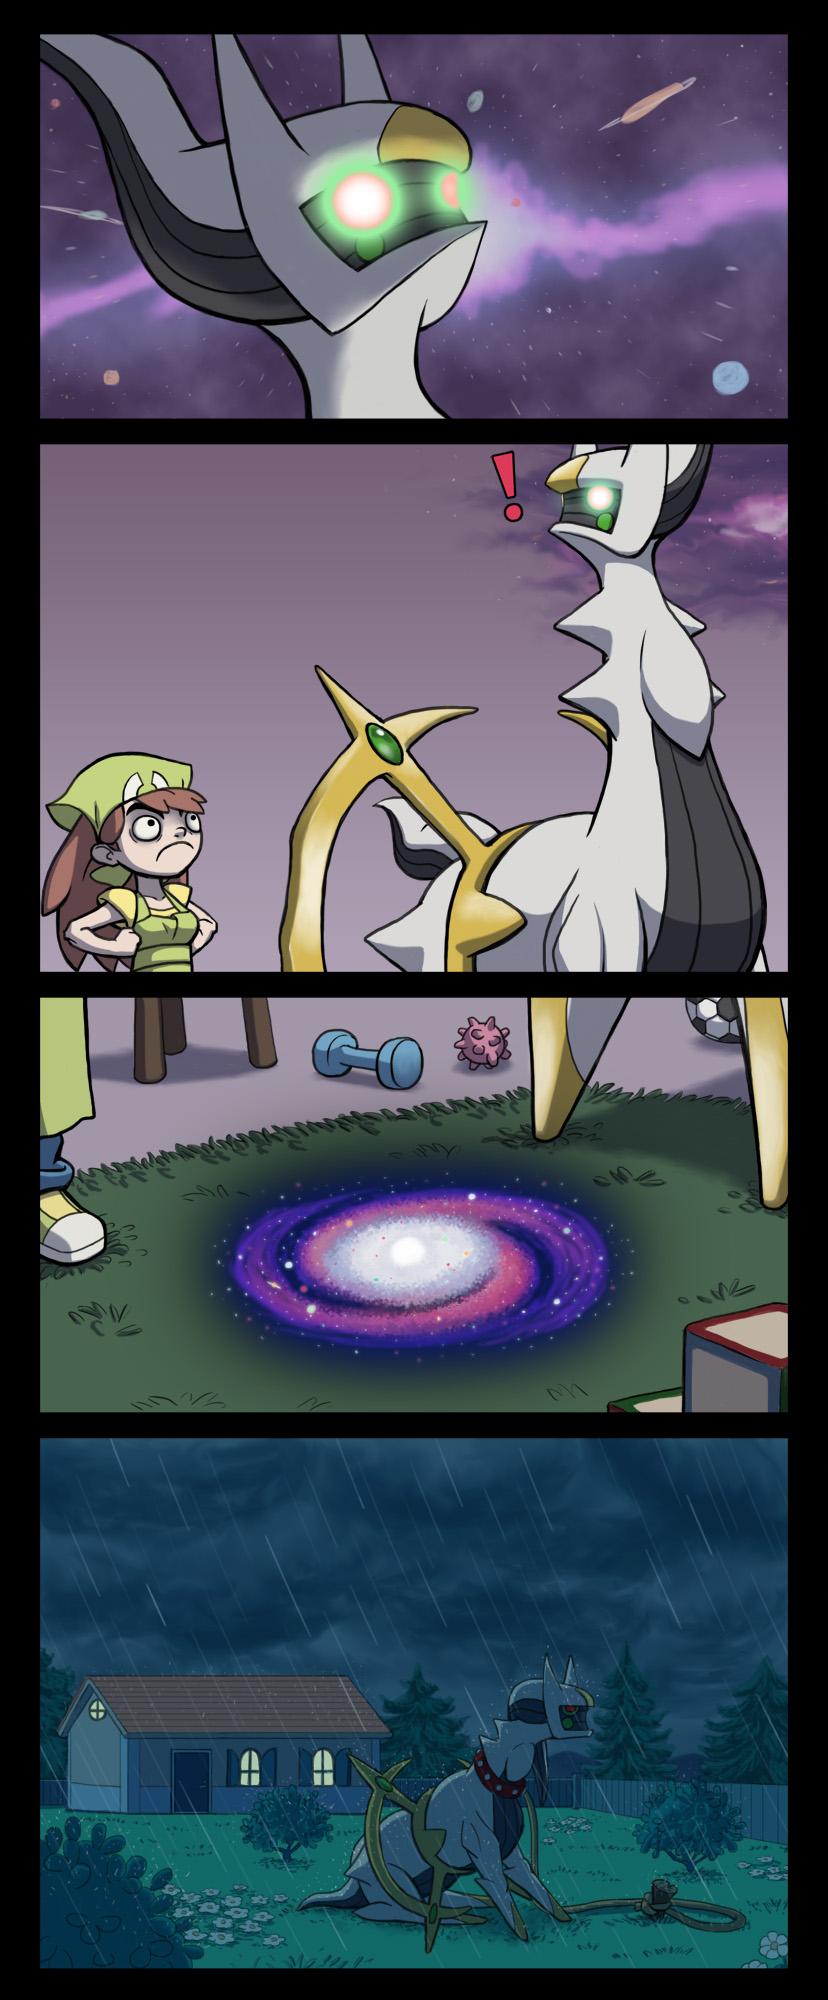 Pokemon arceus meme